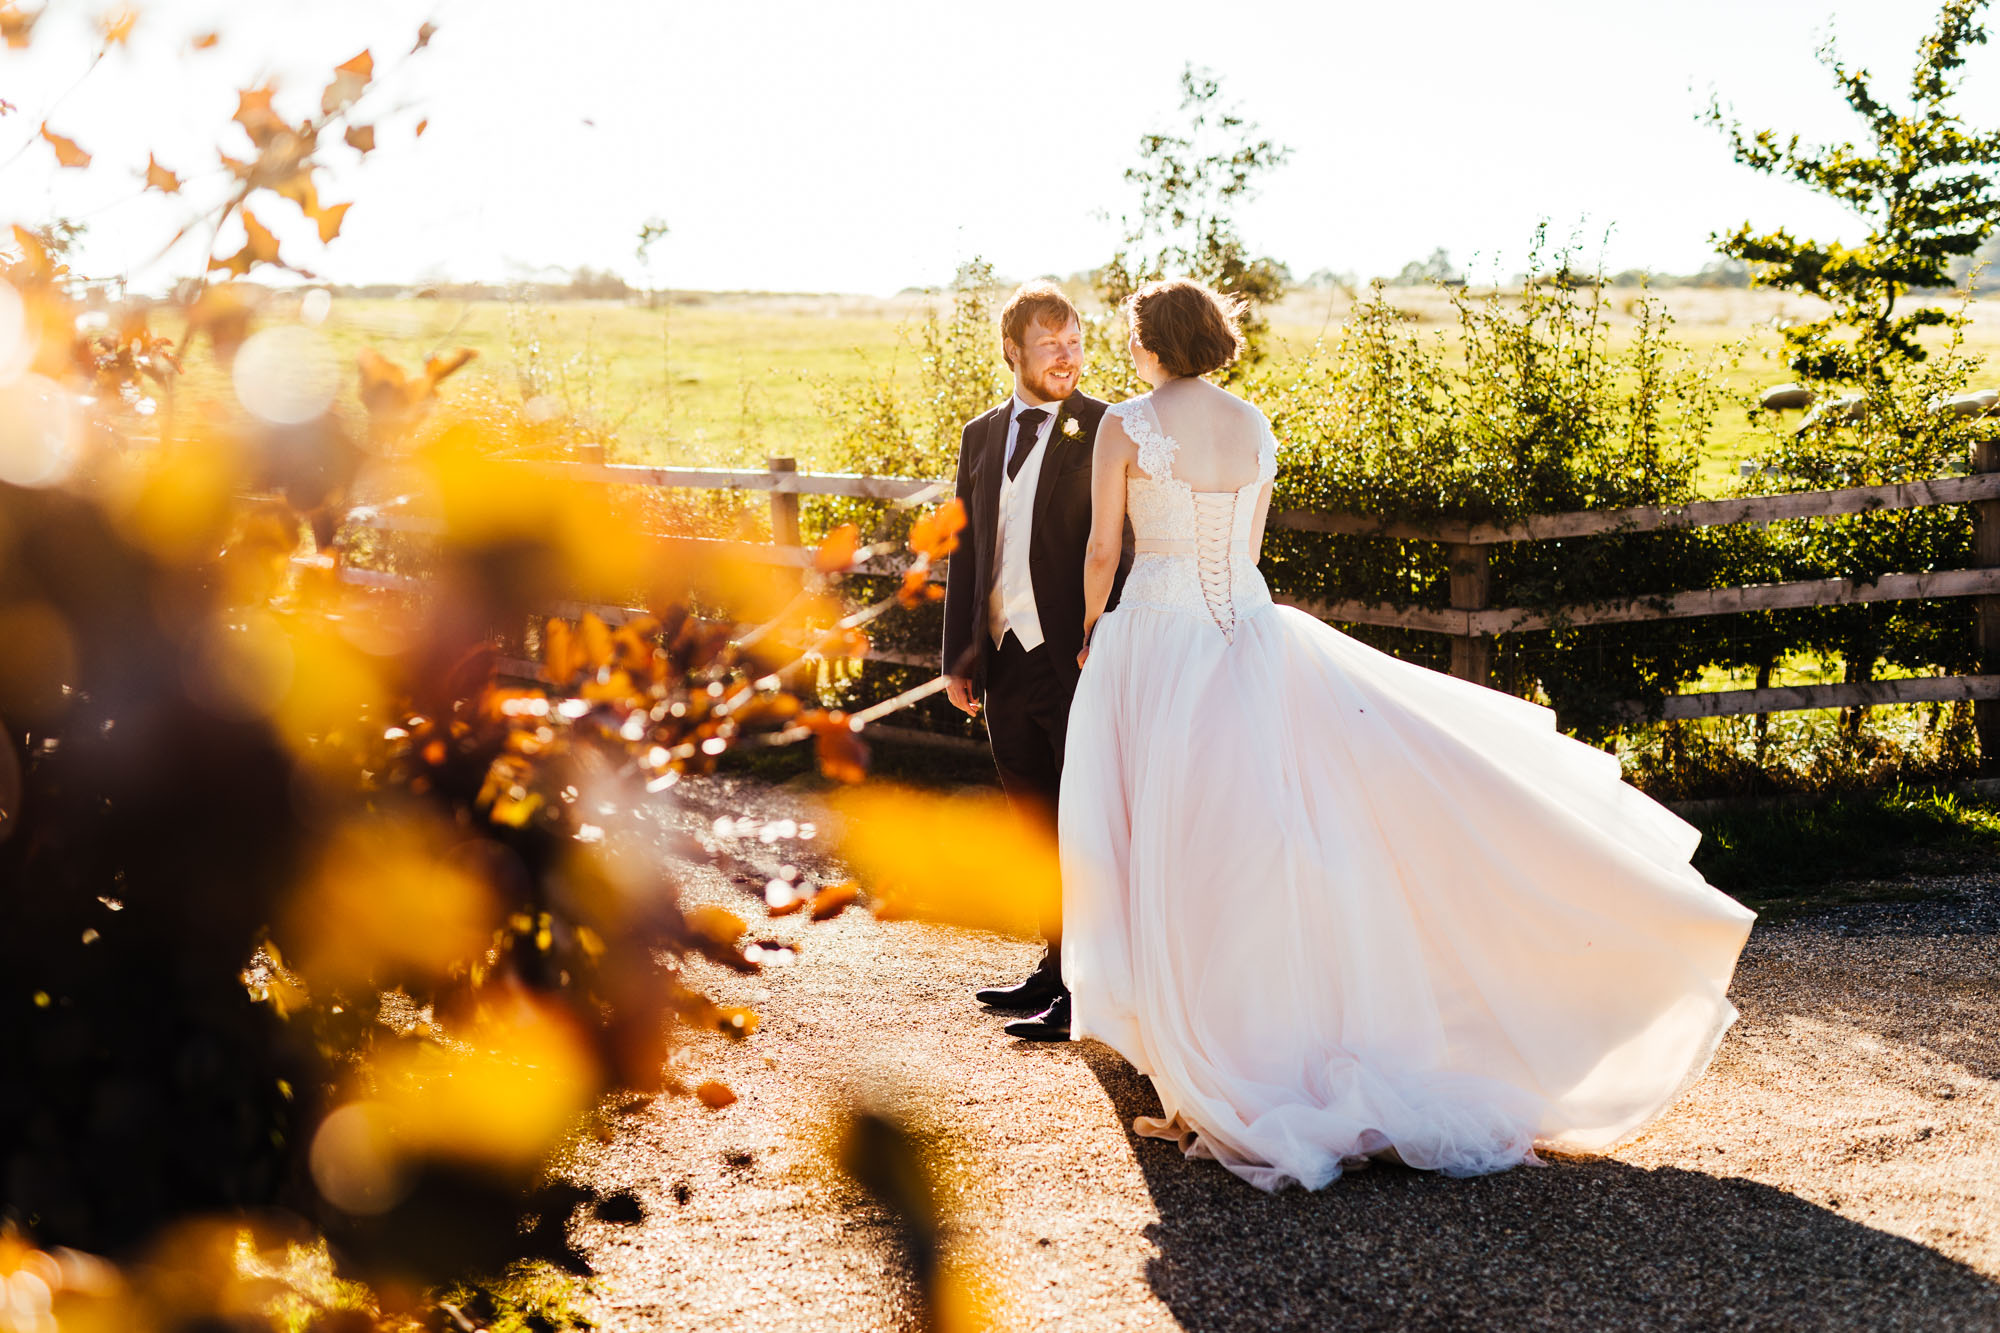 wedding-at-dodford-manor-62